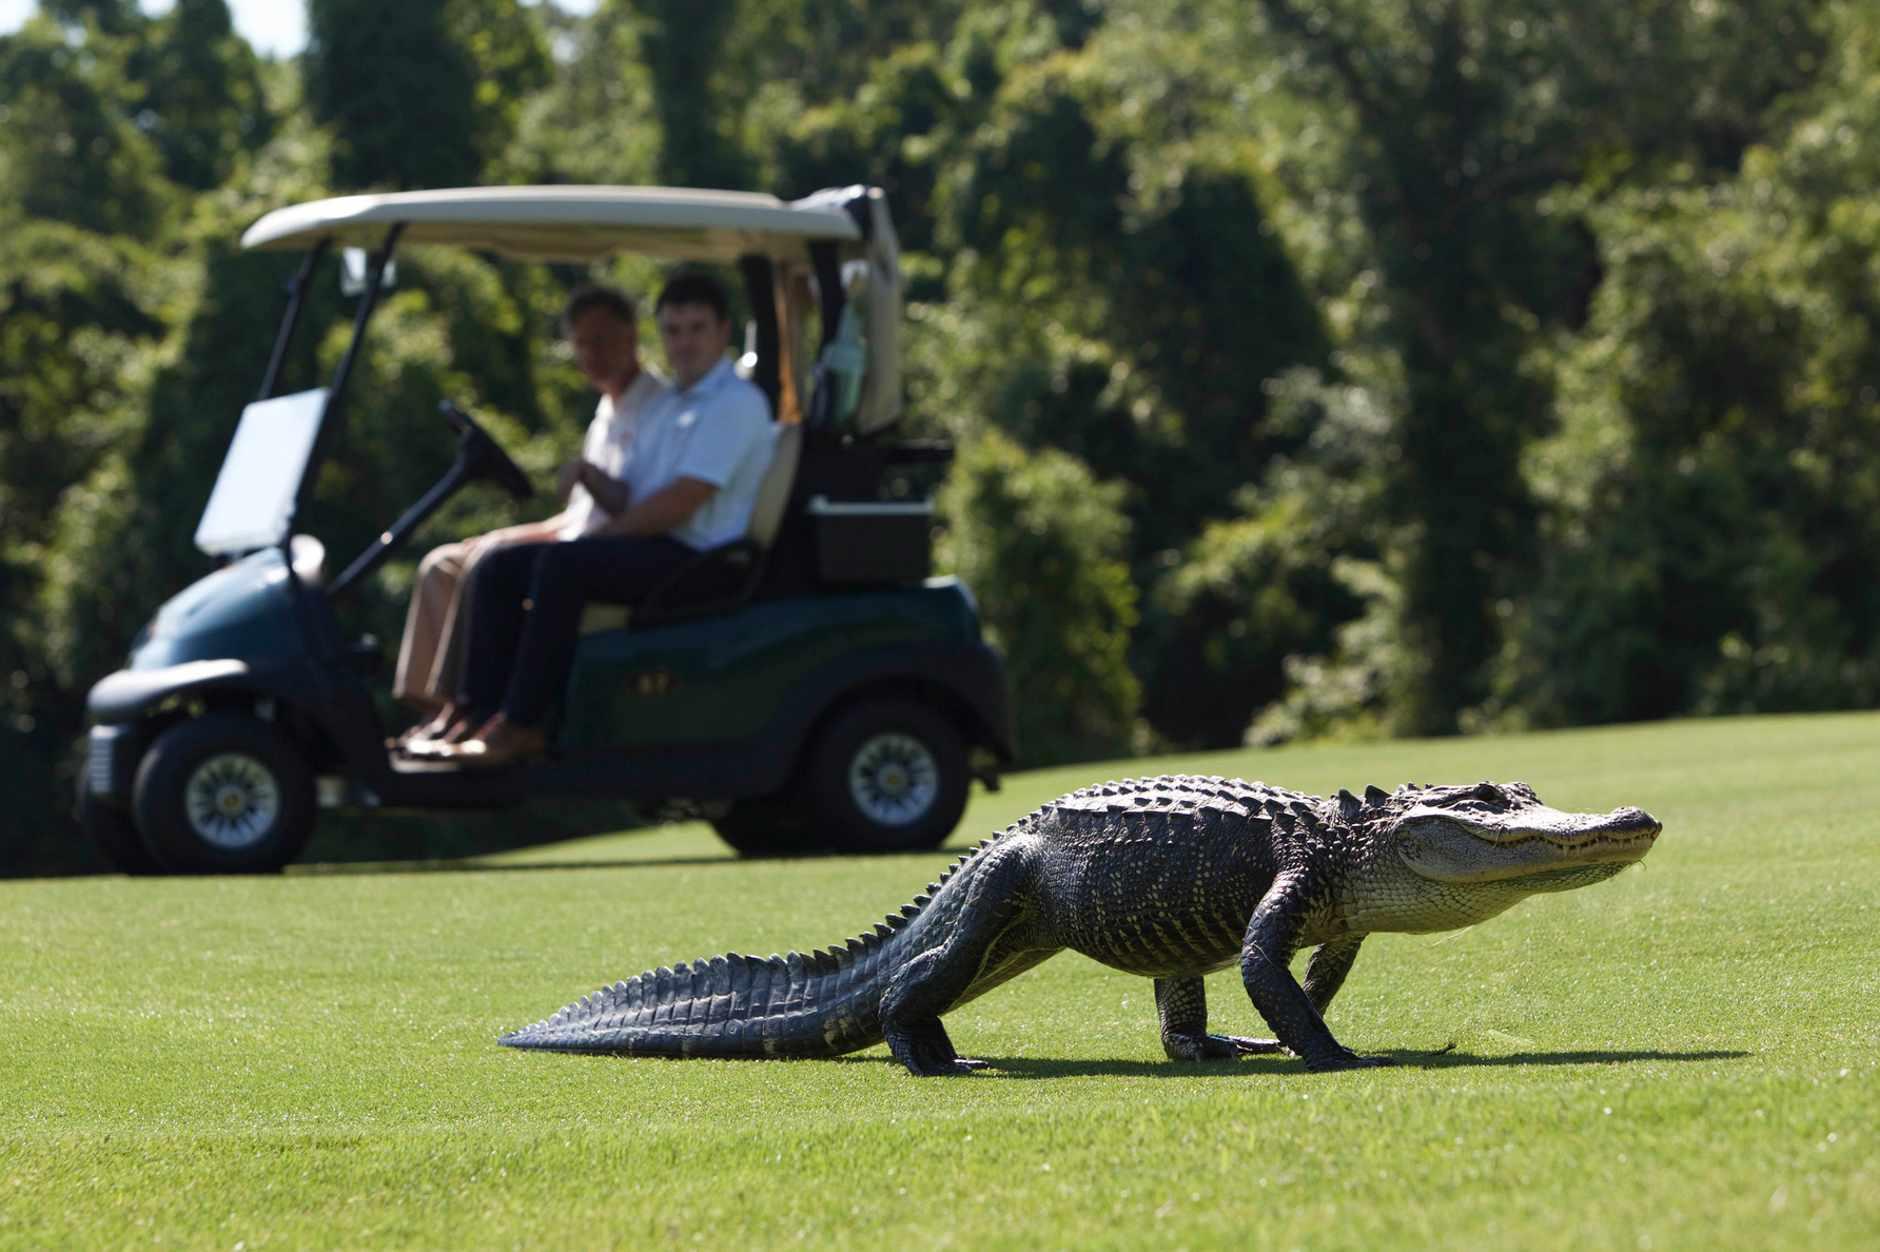 Teeing off: crocodile on golf course on Kiawah Island, US